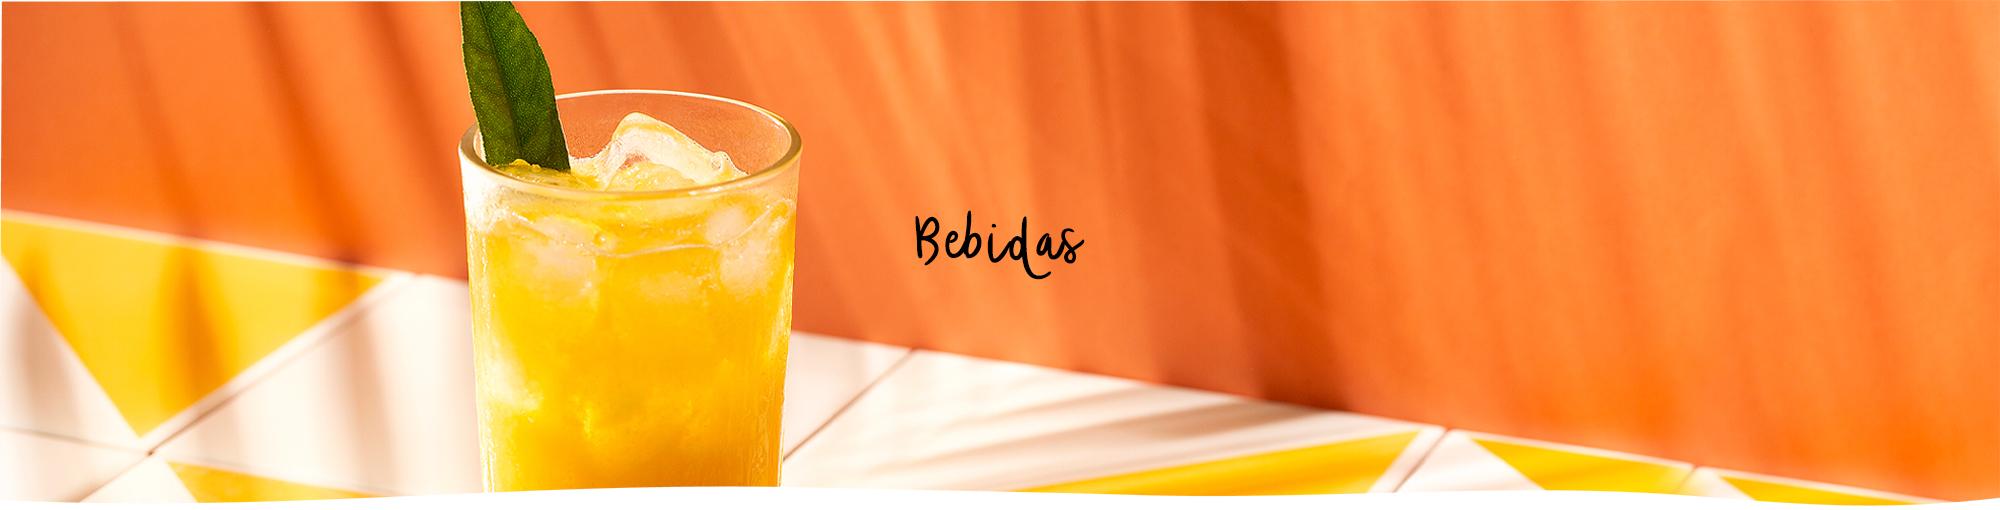 Bebidas - Banner Desktop